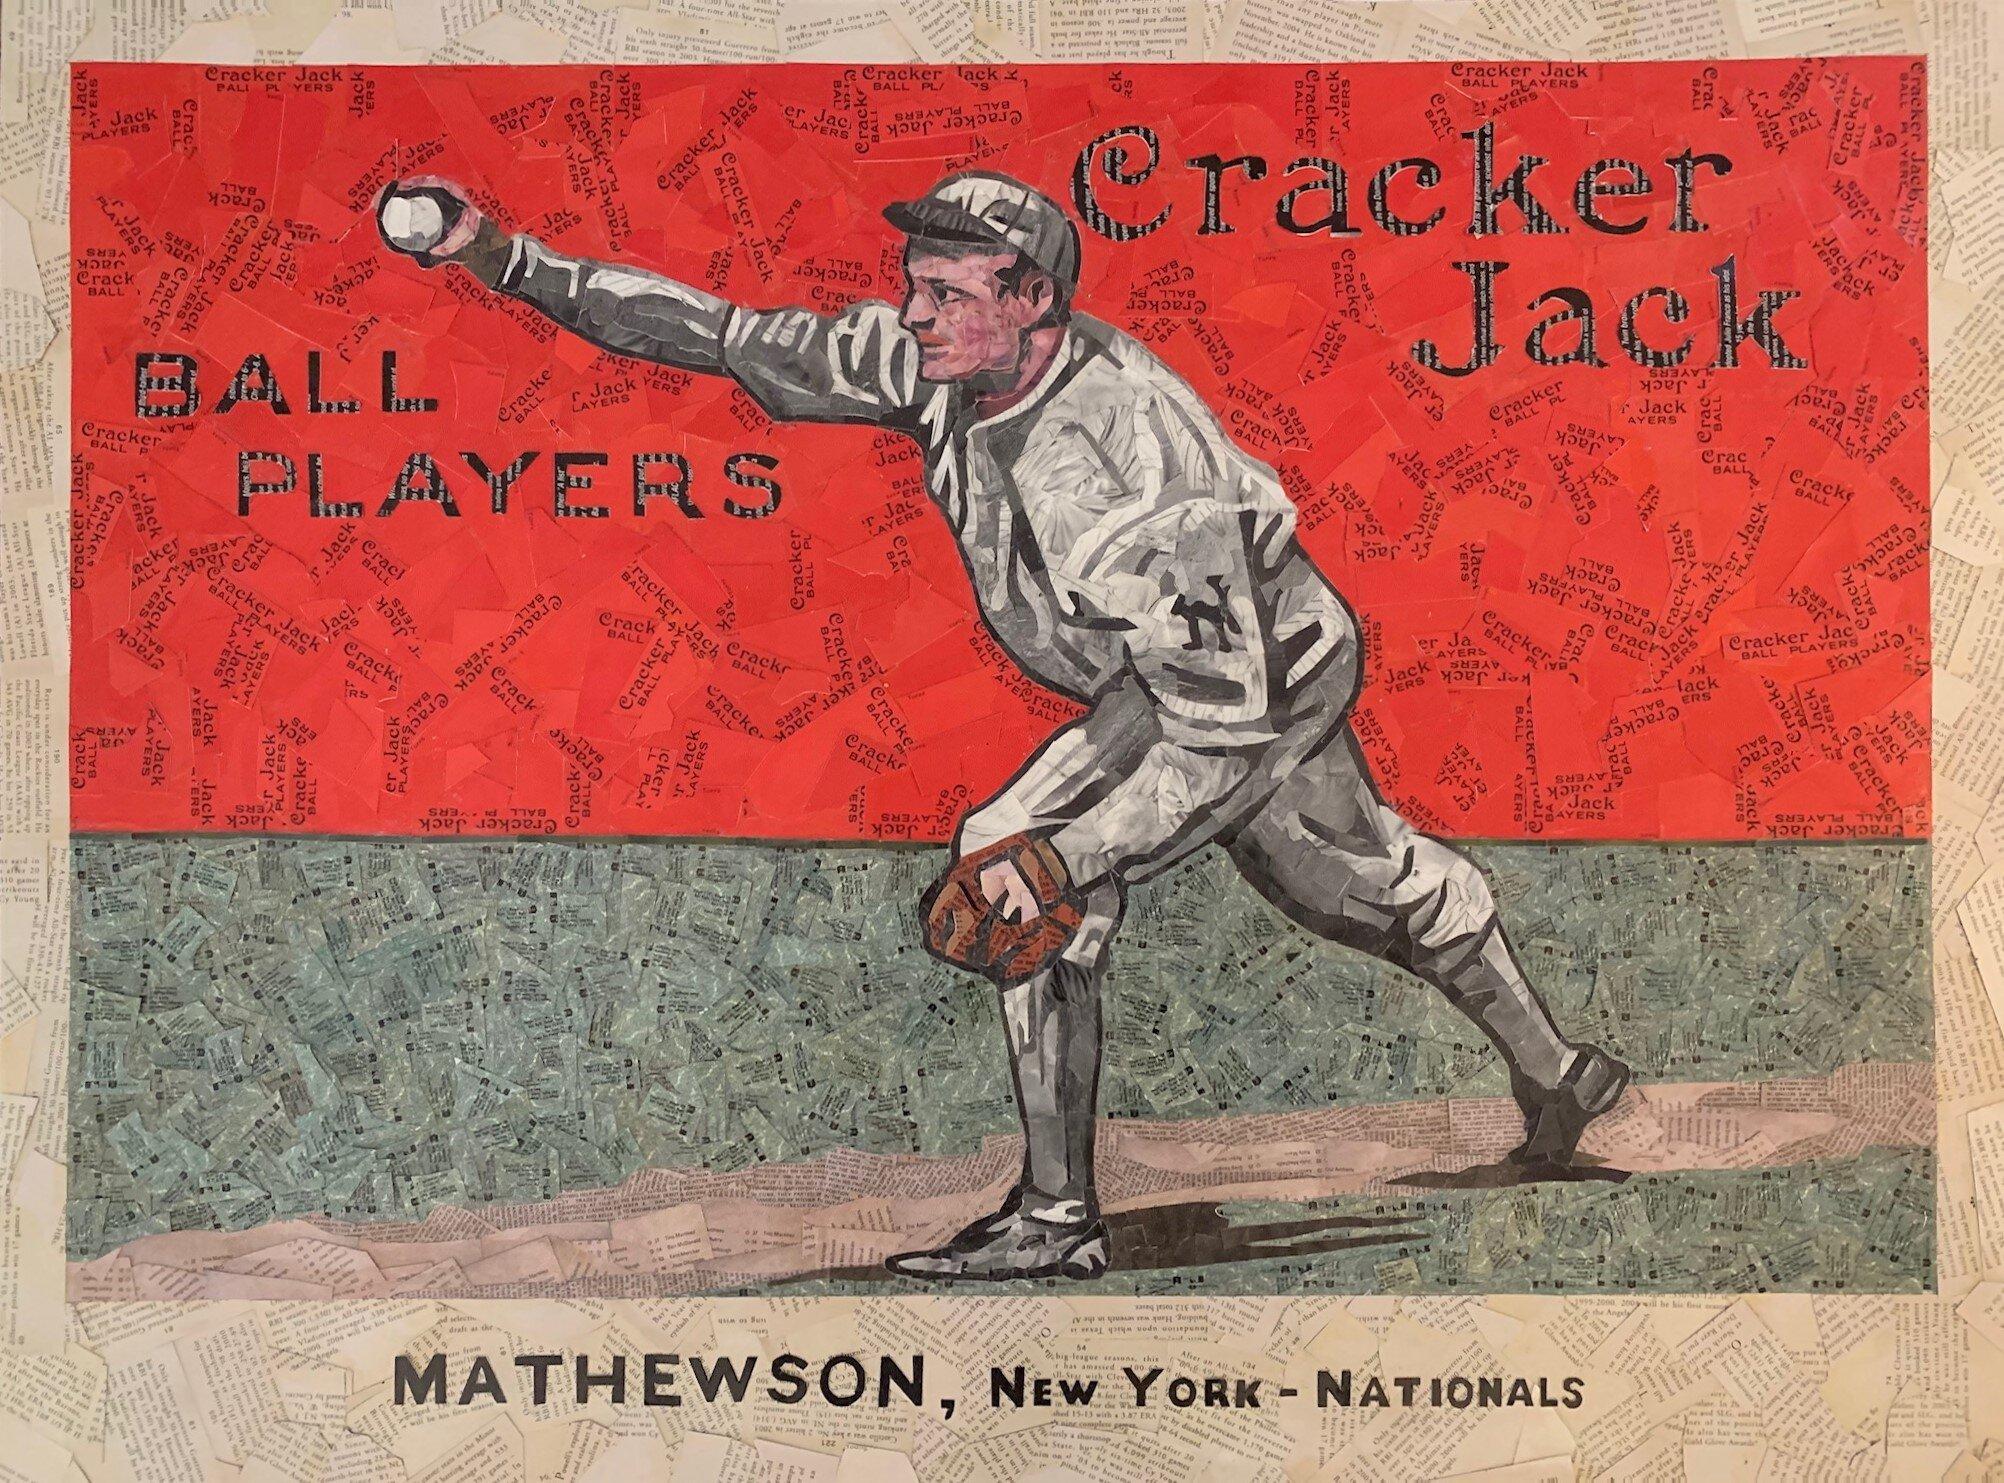 1914 Cracker Jack Christy Mathewson